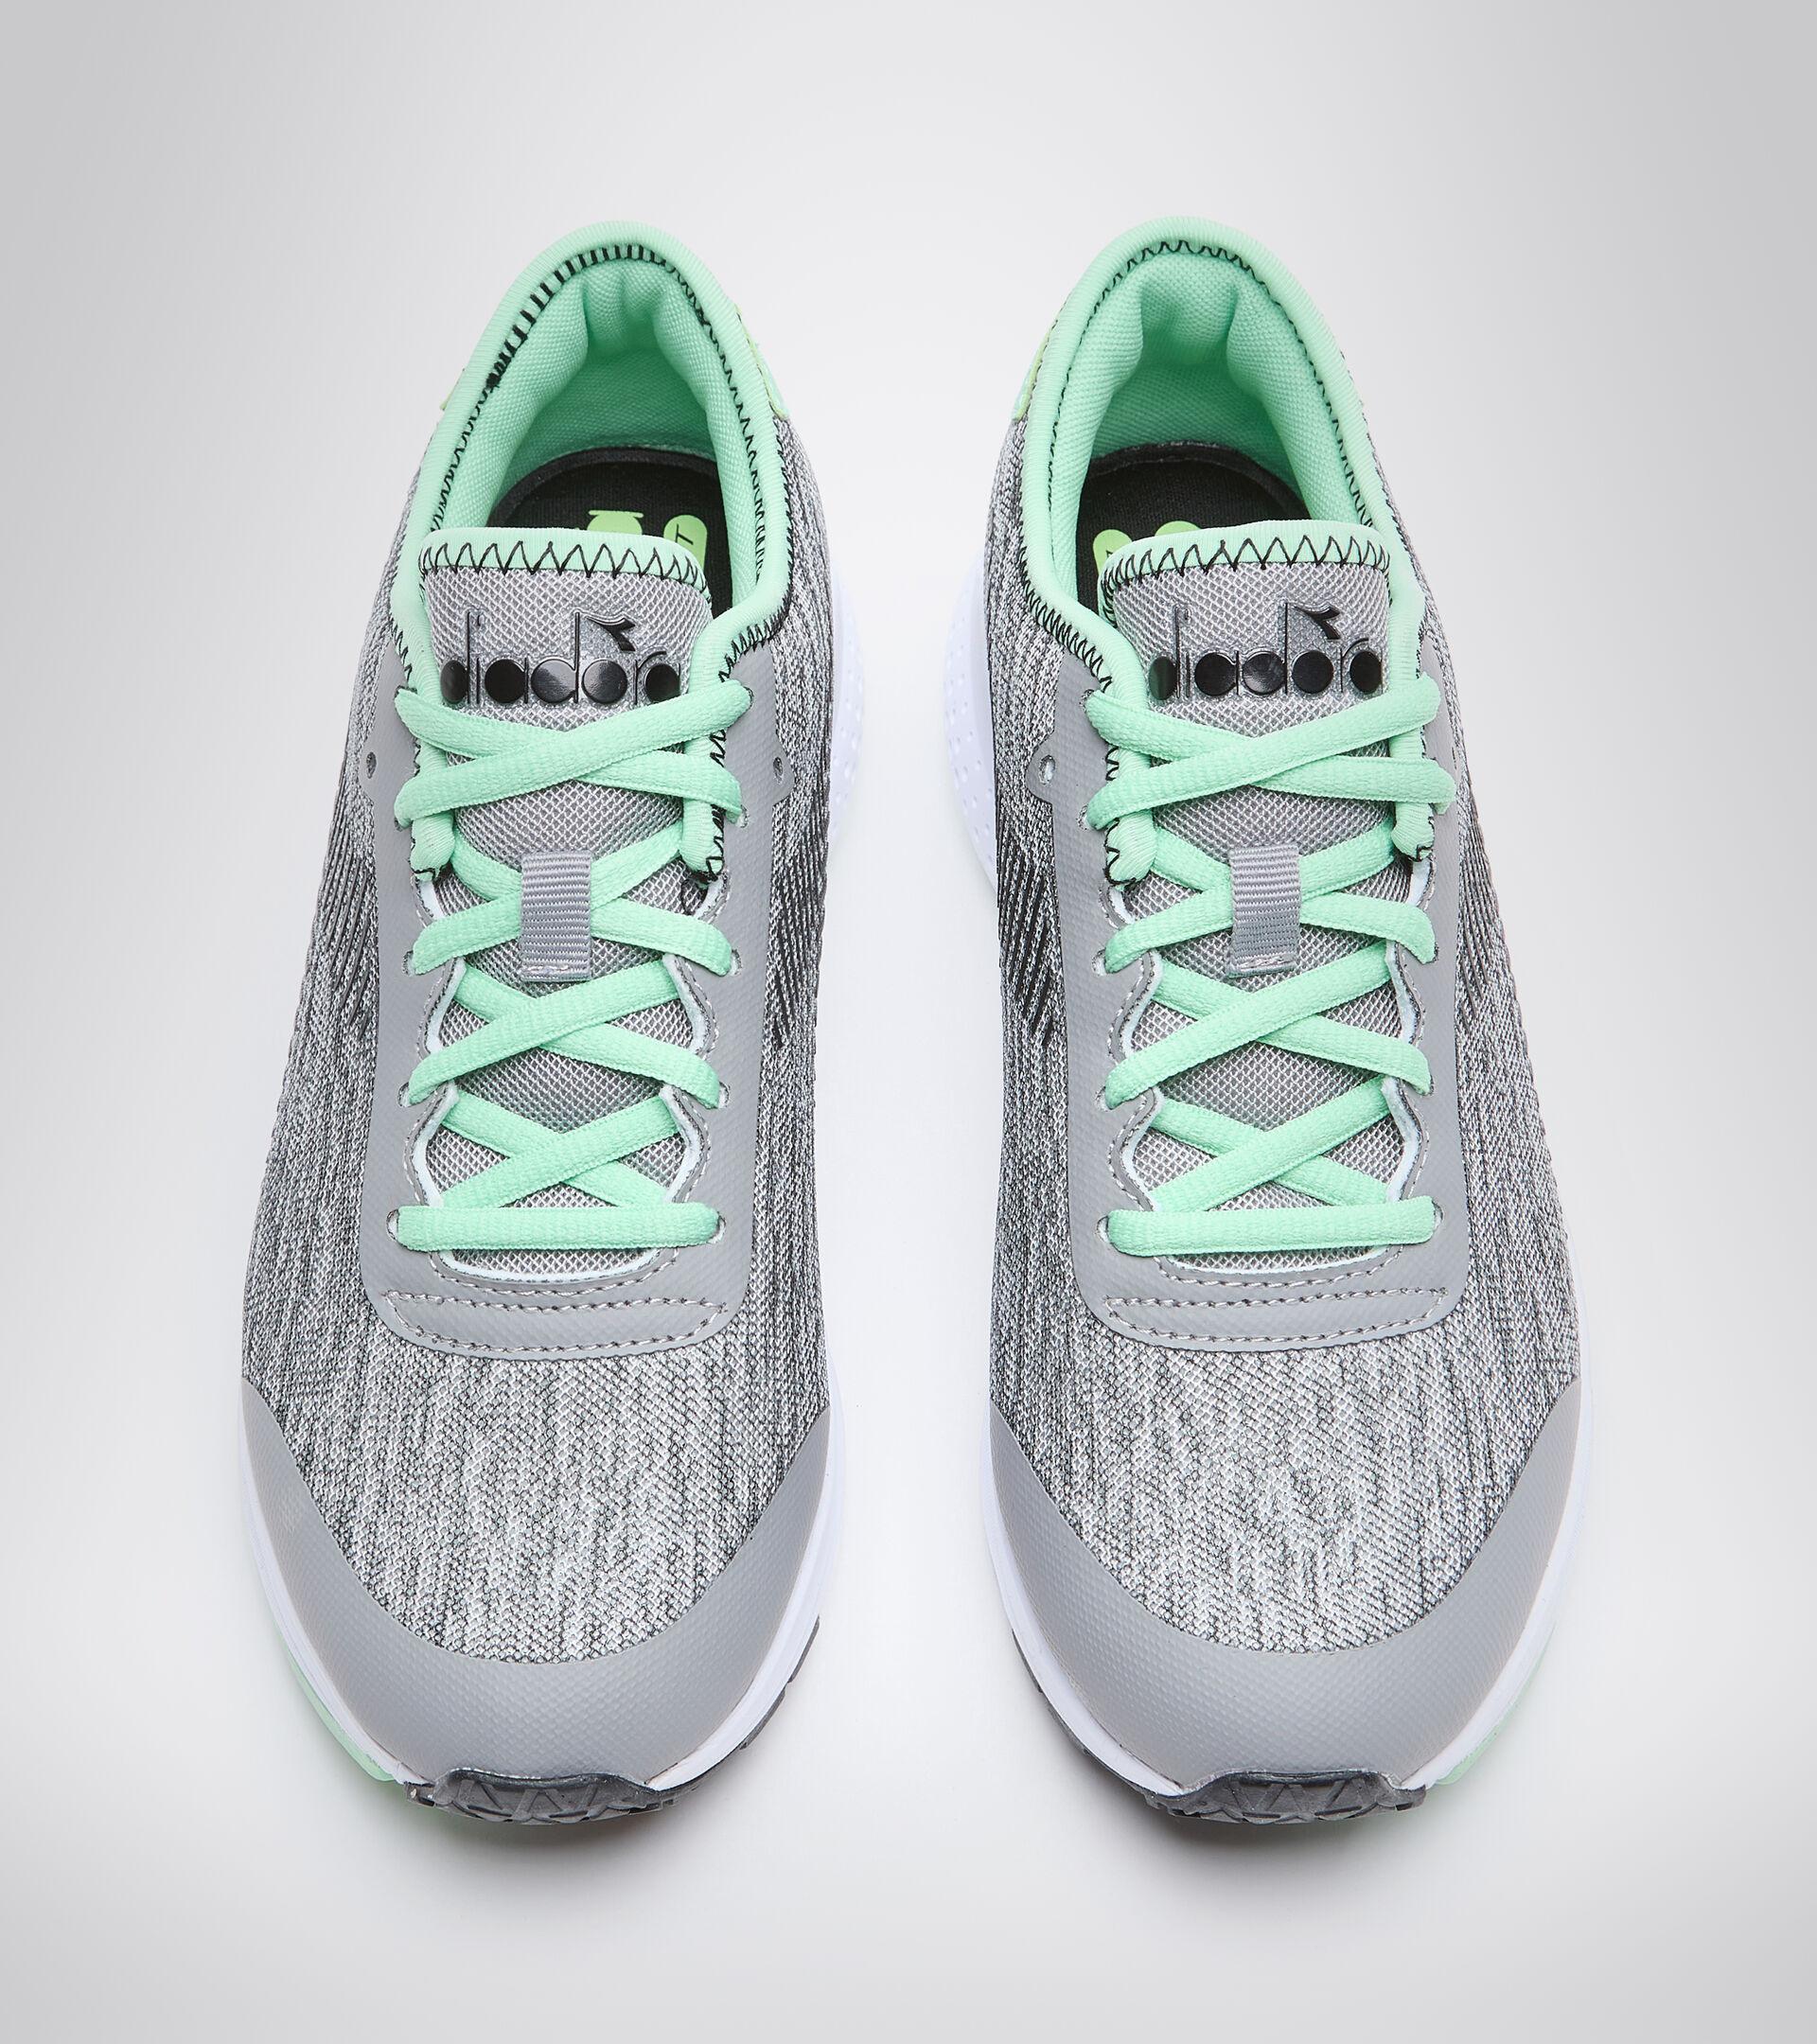 Zapatillas deportivas - Mujer PASSO W PLATA/NEGRO/VERDE FRESNO - Diadora